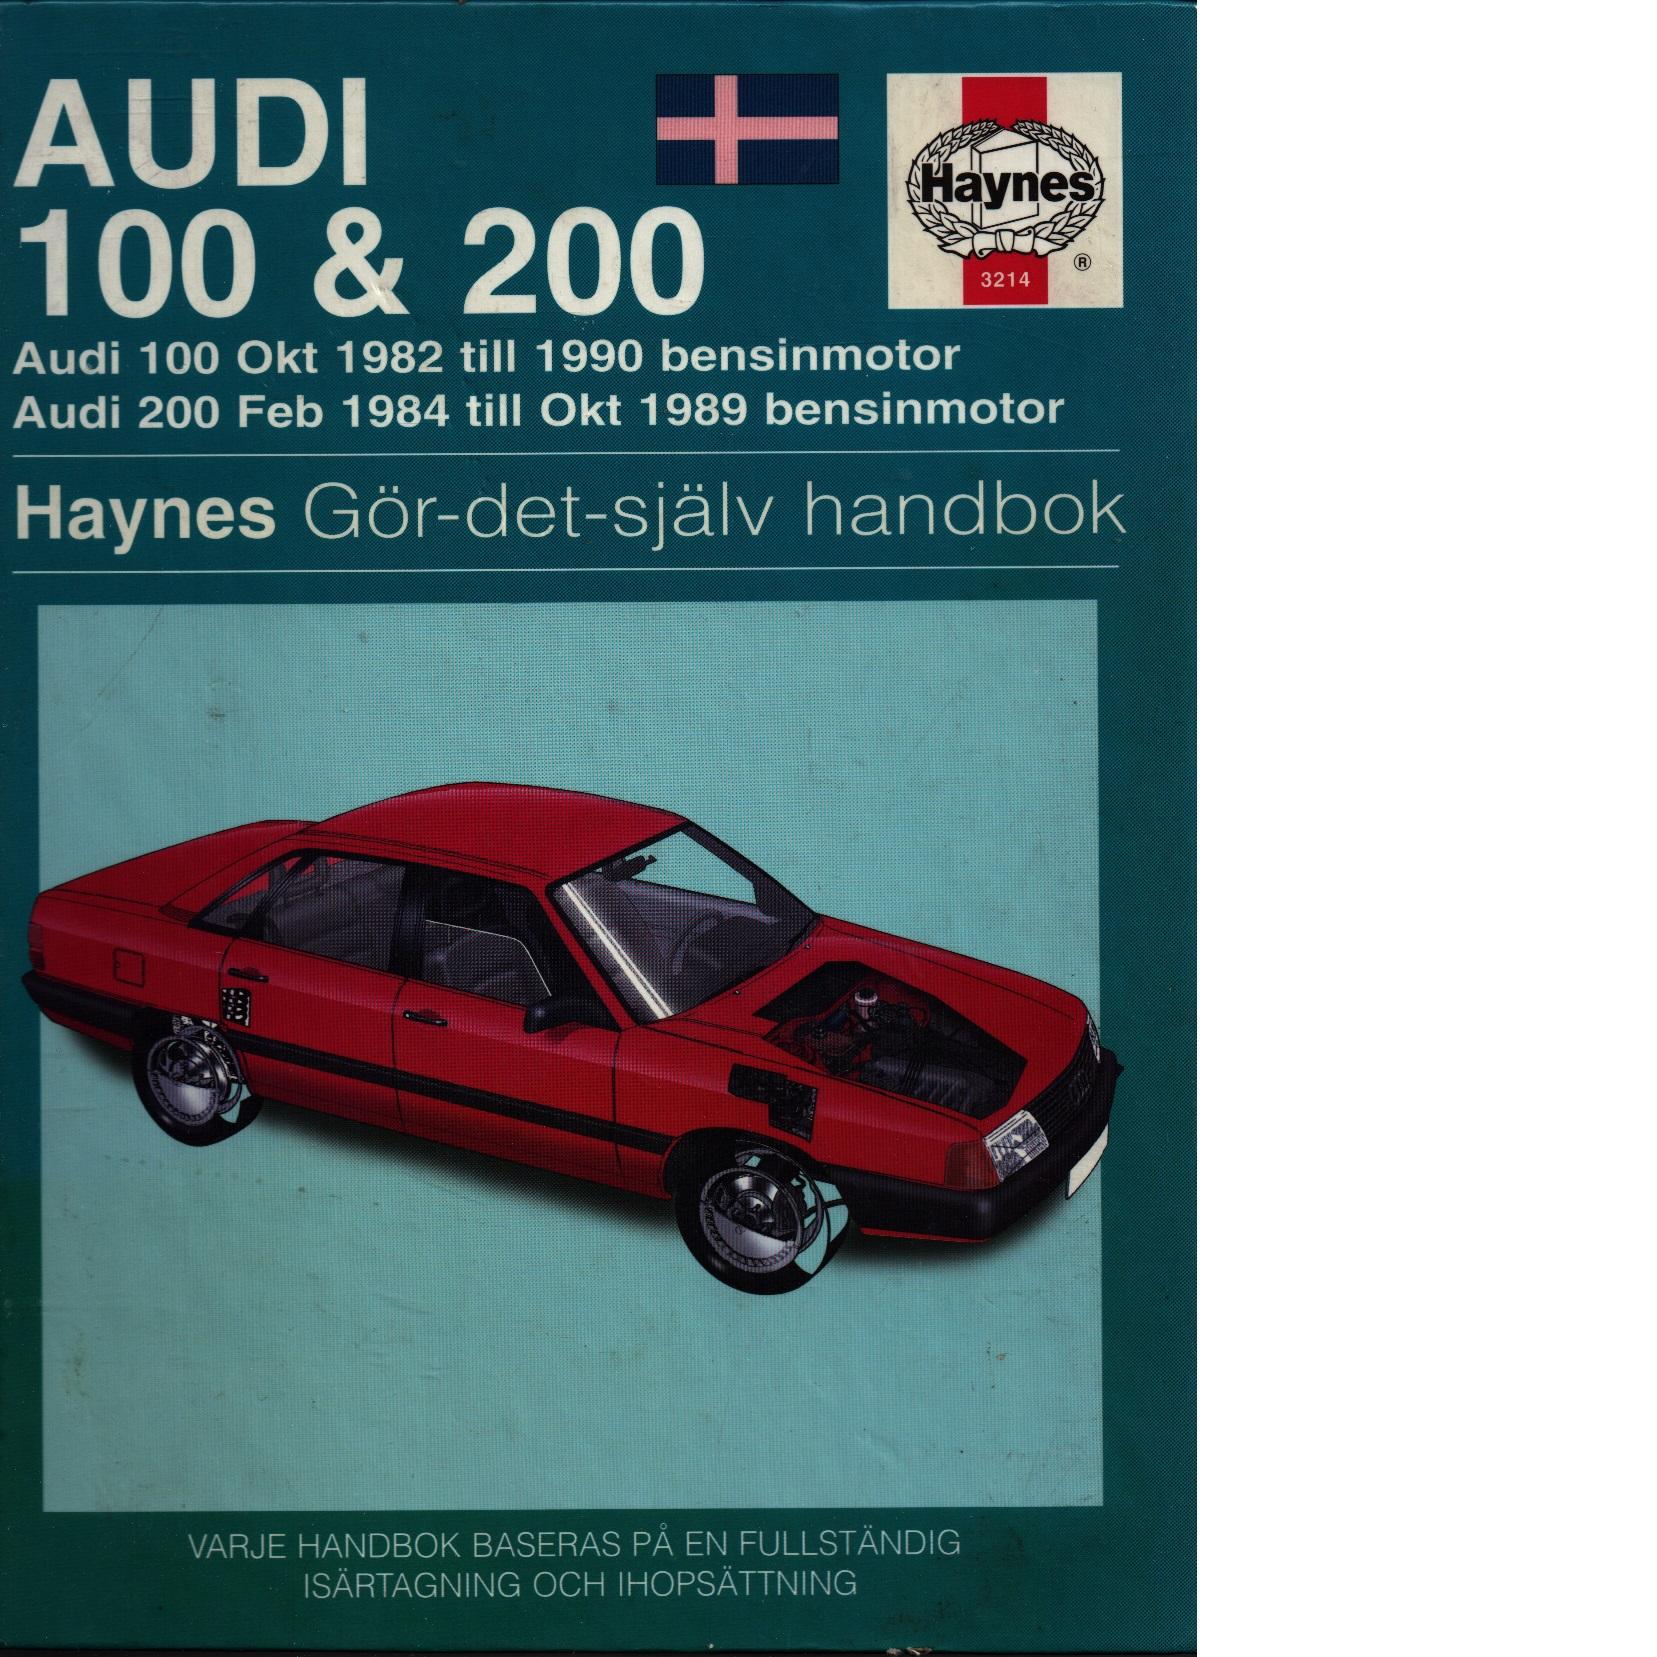 Audi 100 & 200 - Mead, John S.